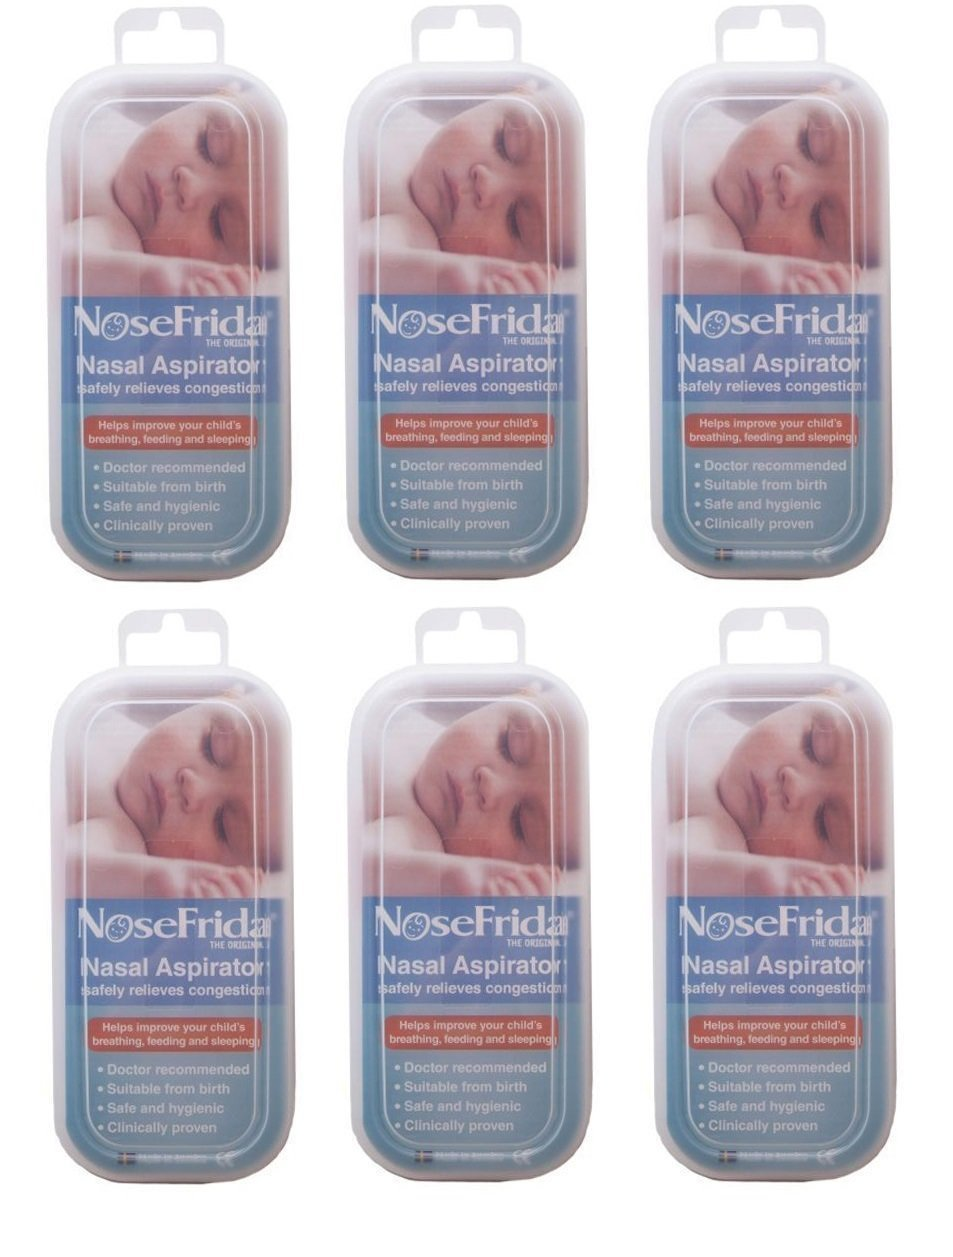 Nosefrida Nasal Aspirator - 6 Pack